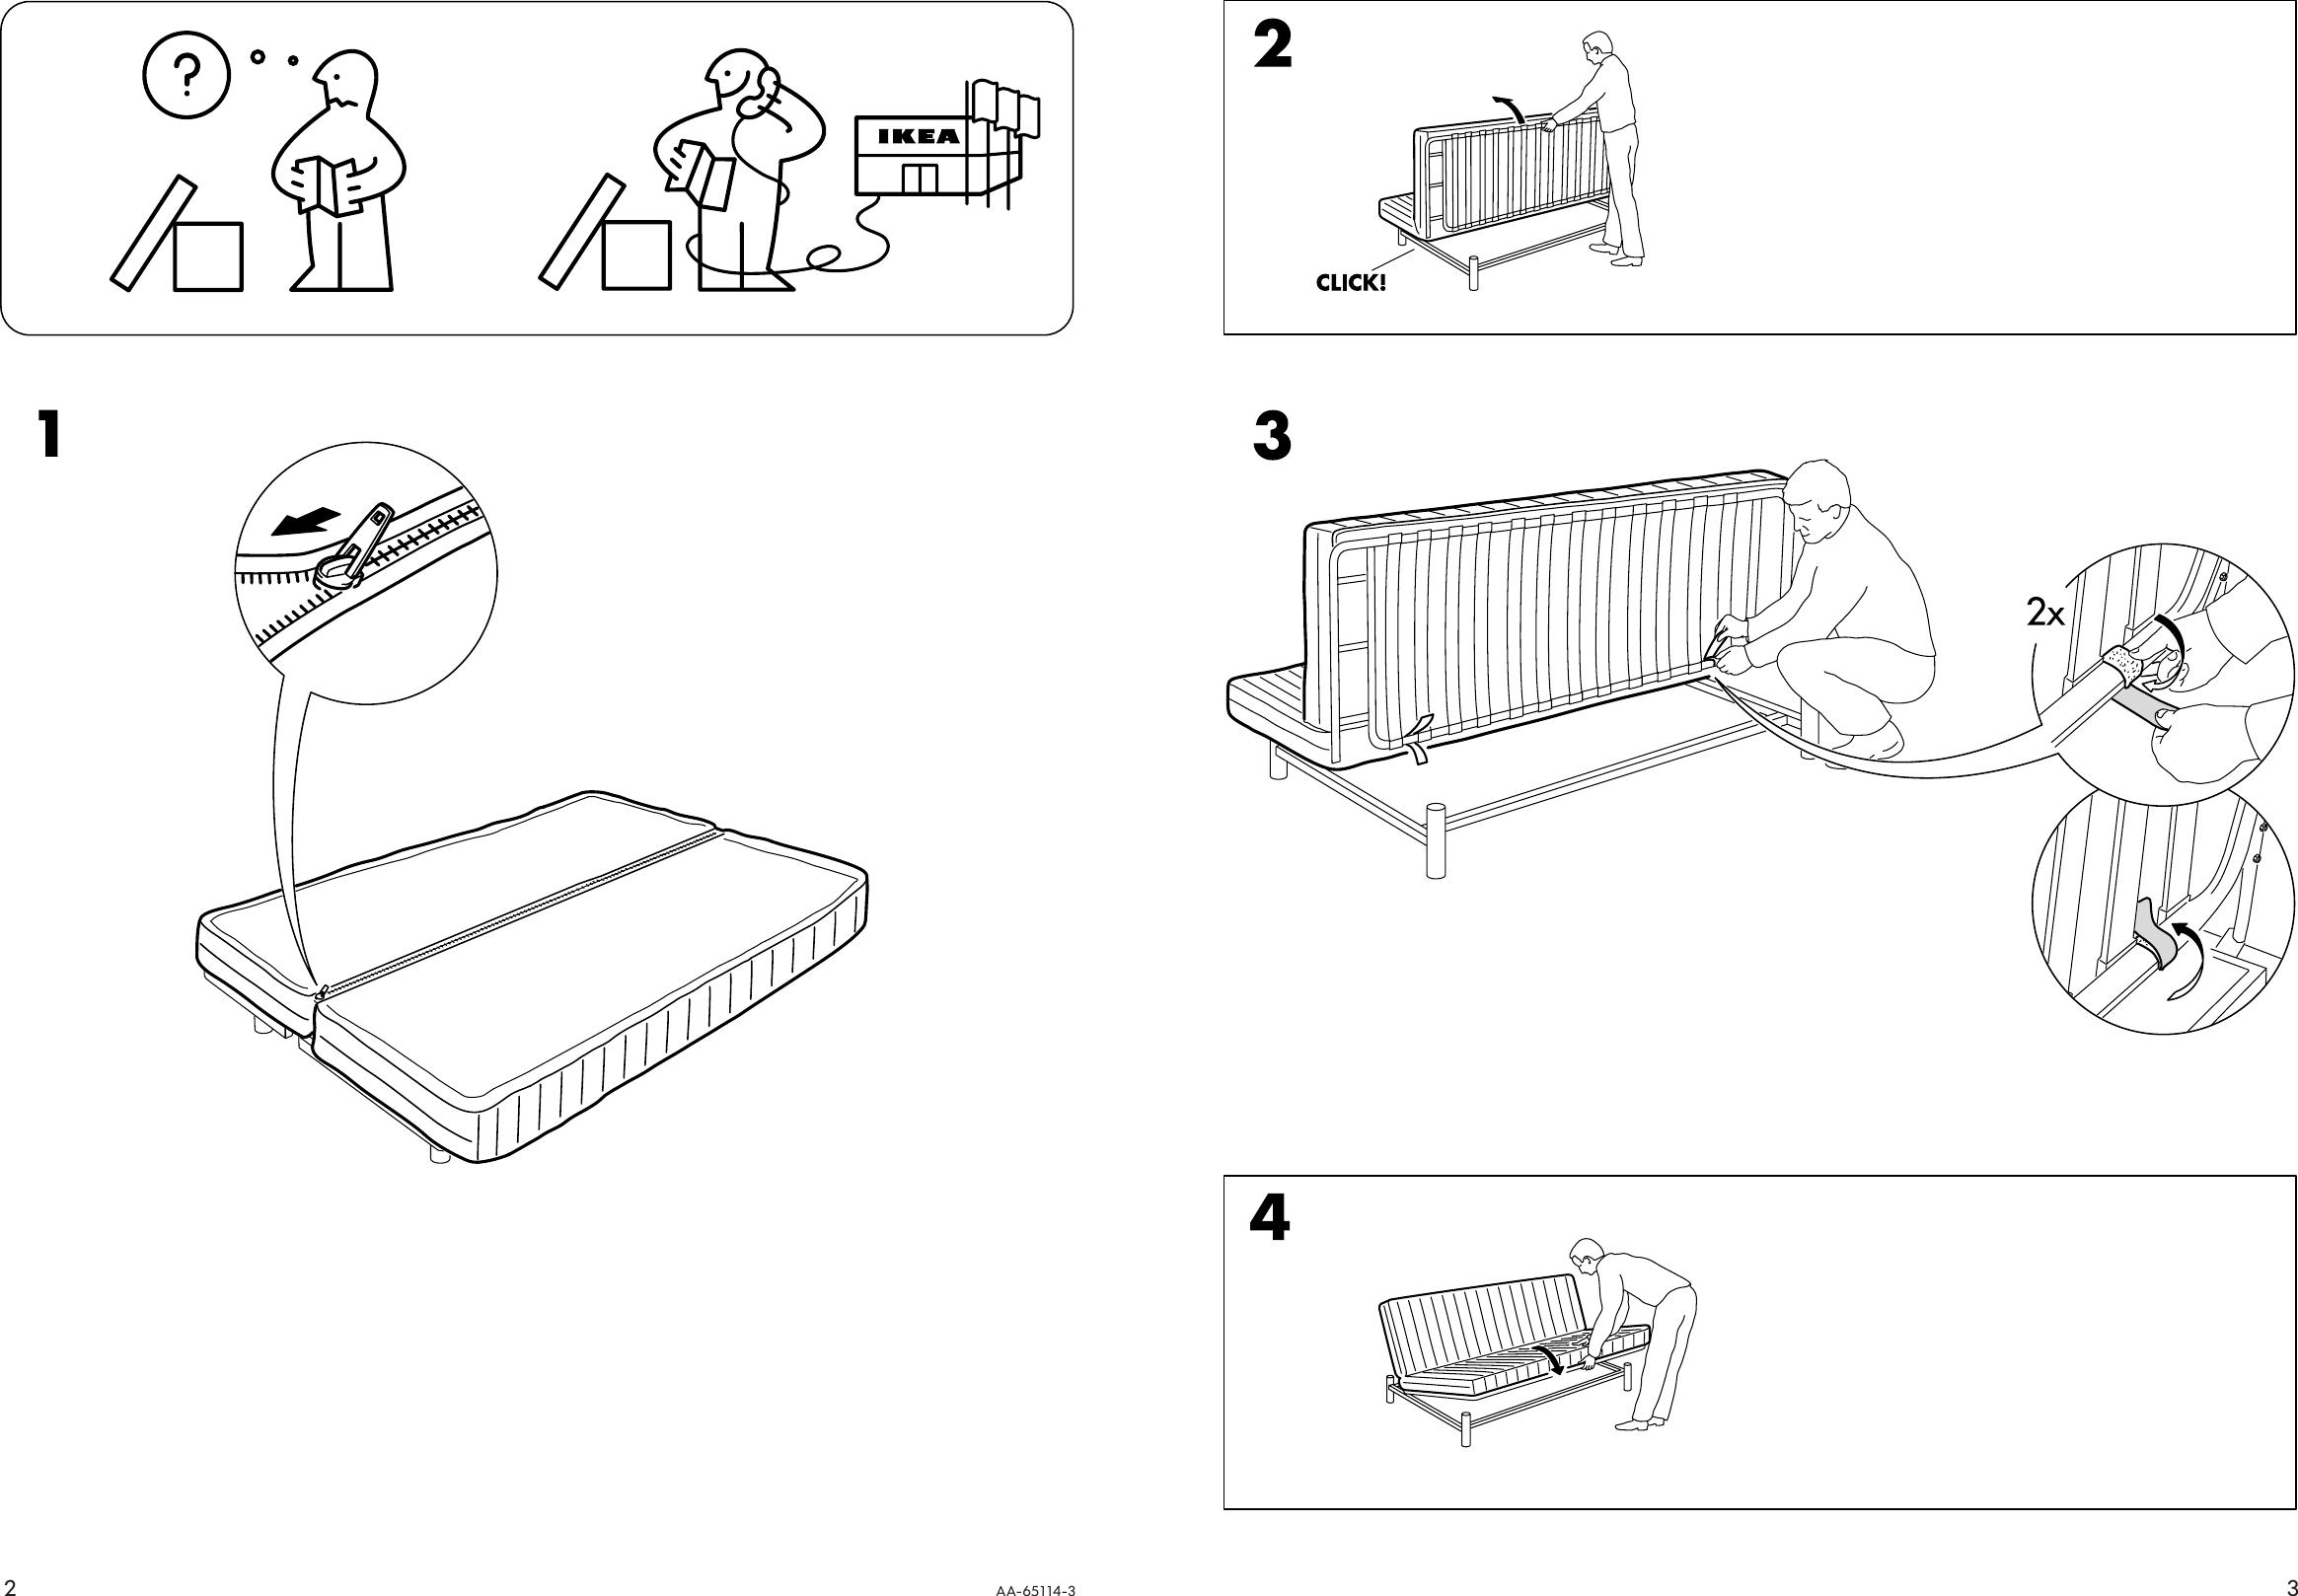 Ikea Beddinge Sofa Bed Mattress Assembly Instruction